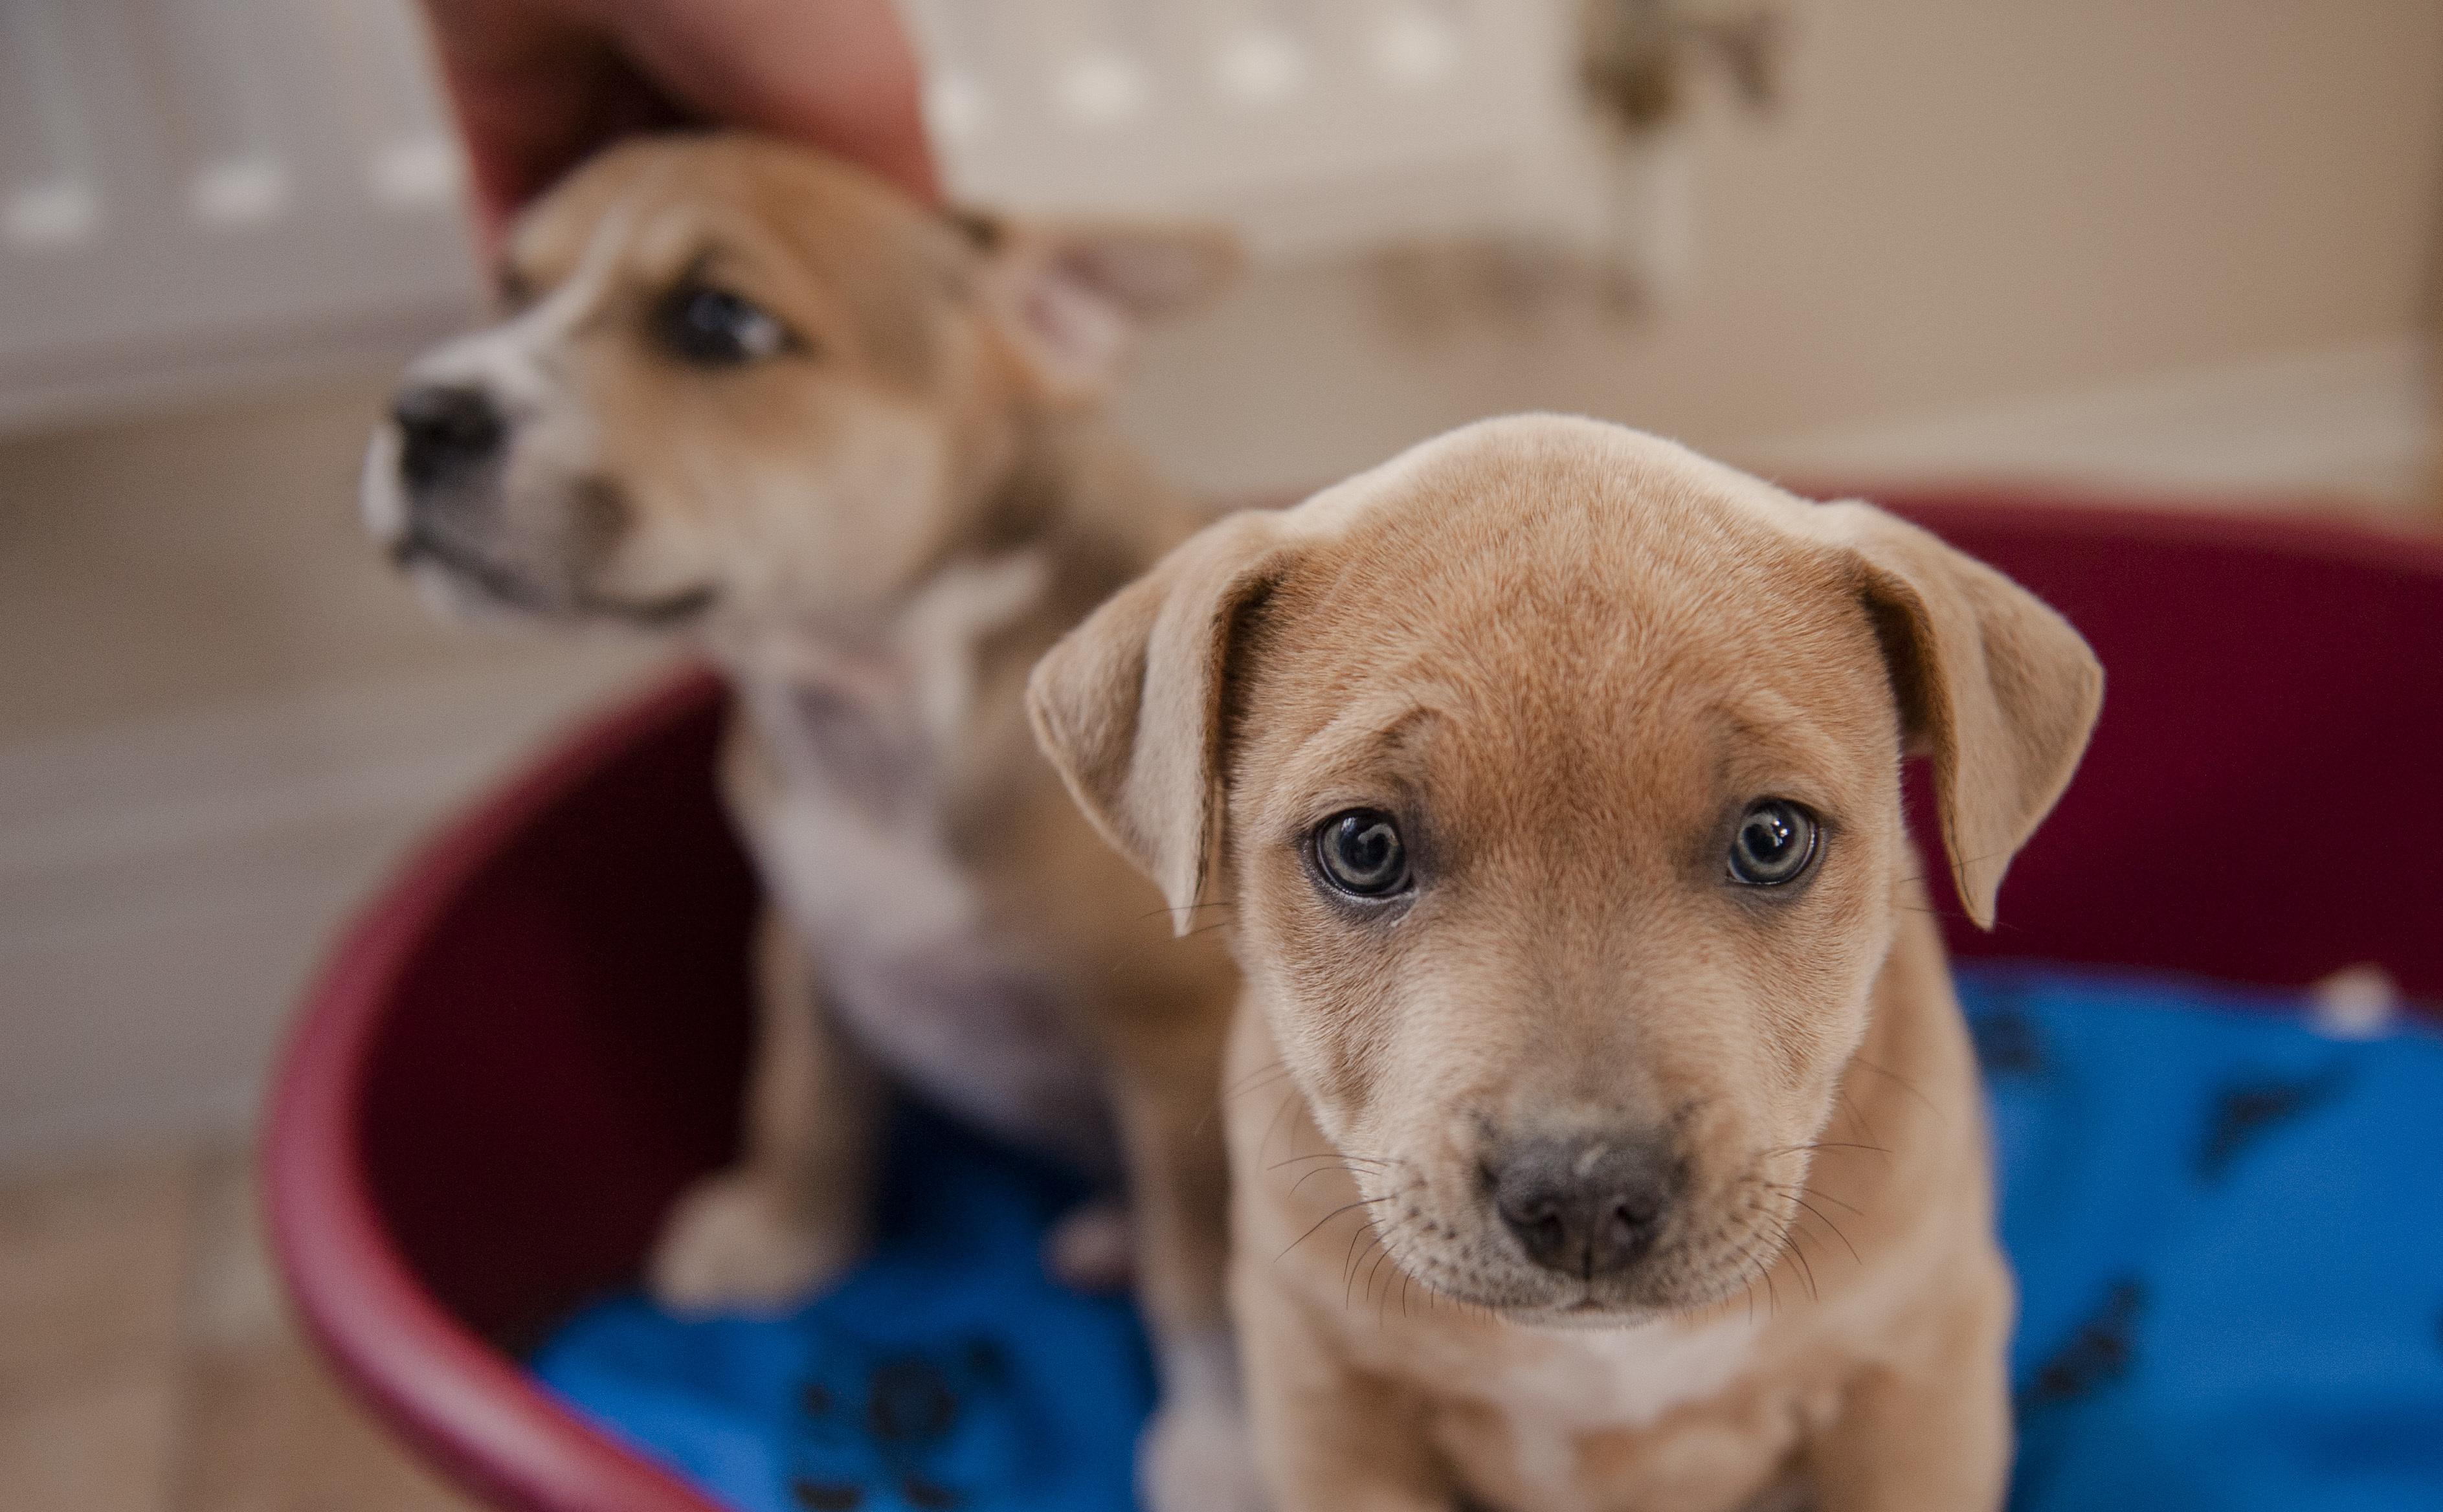 Canine Parvovirus | Symptoms and Treatment | Blue Cross